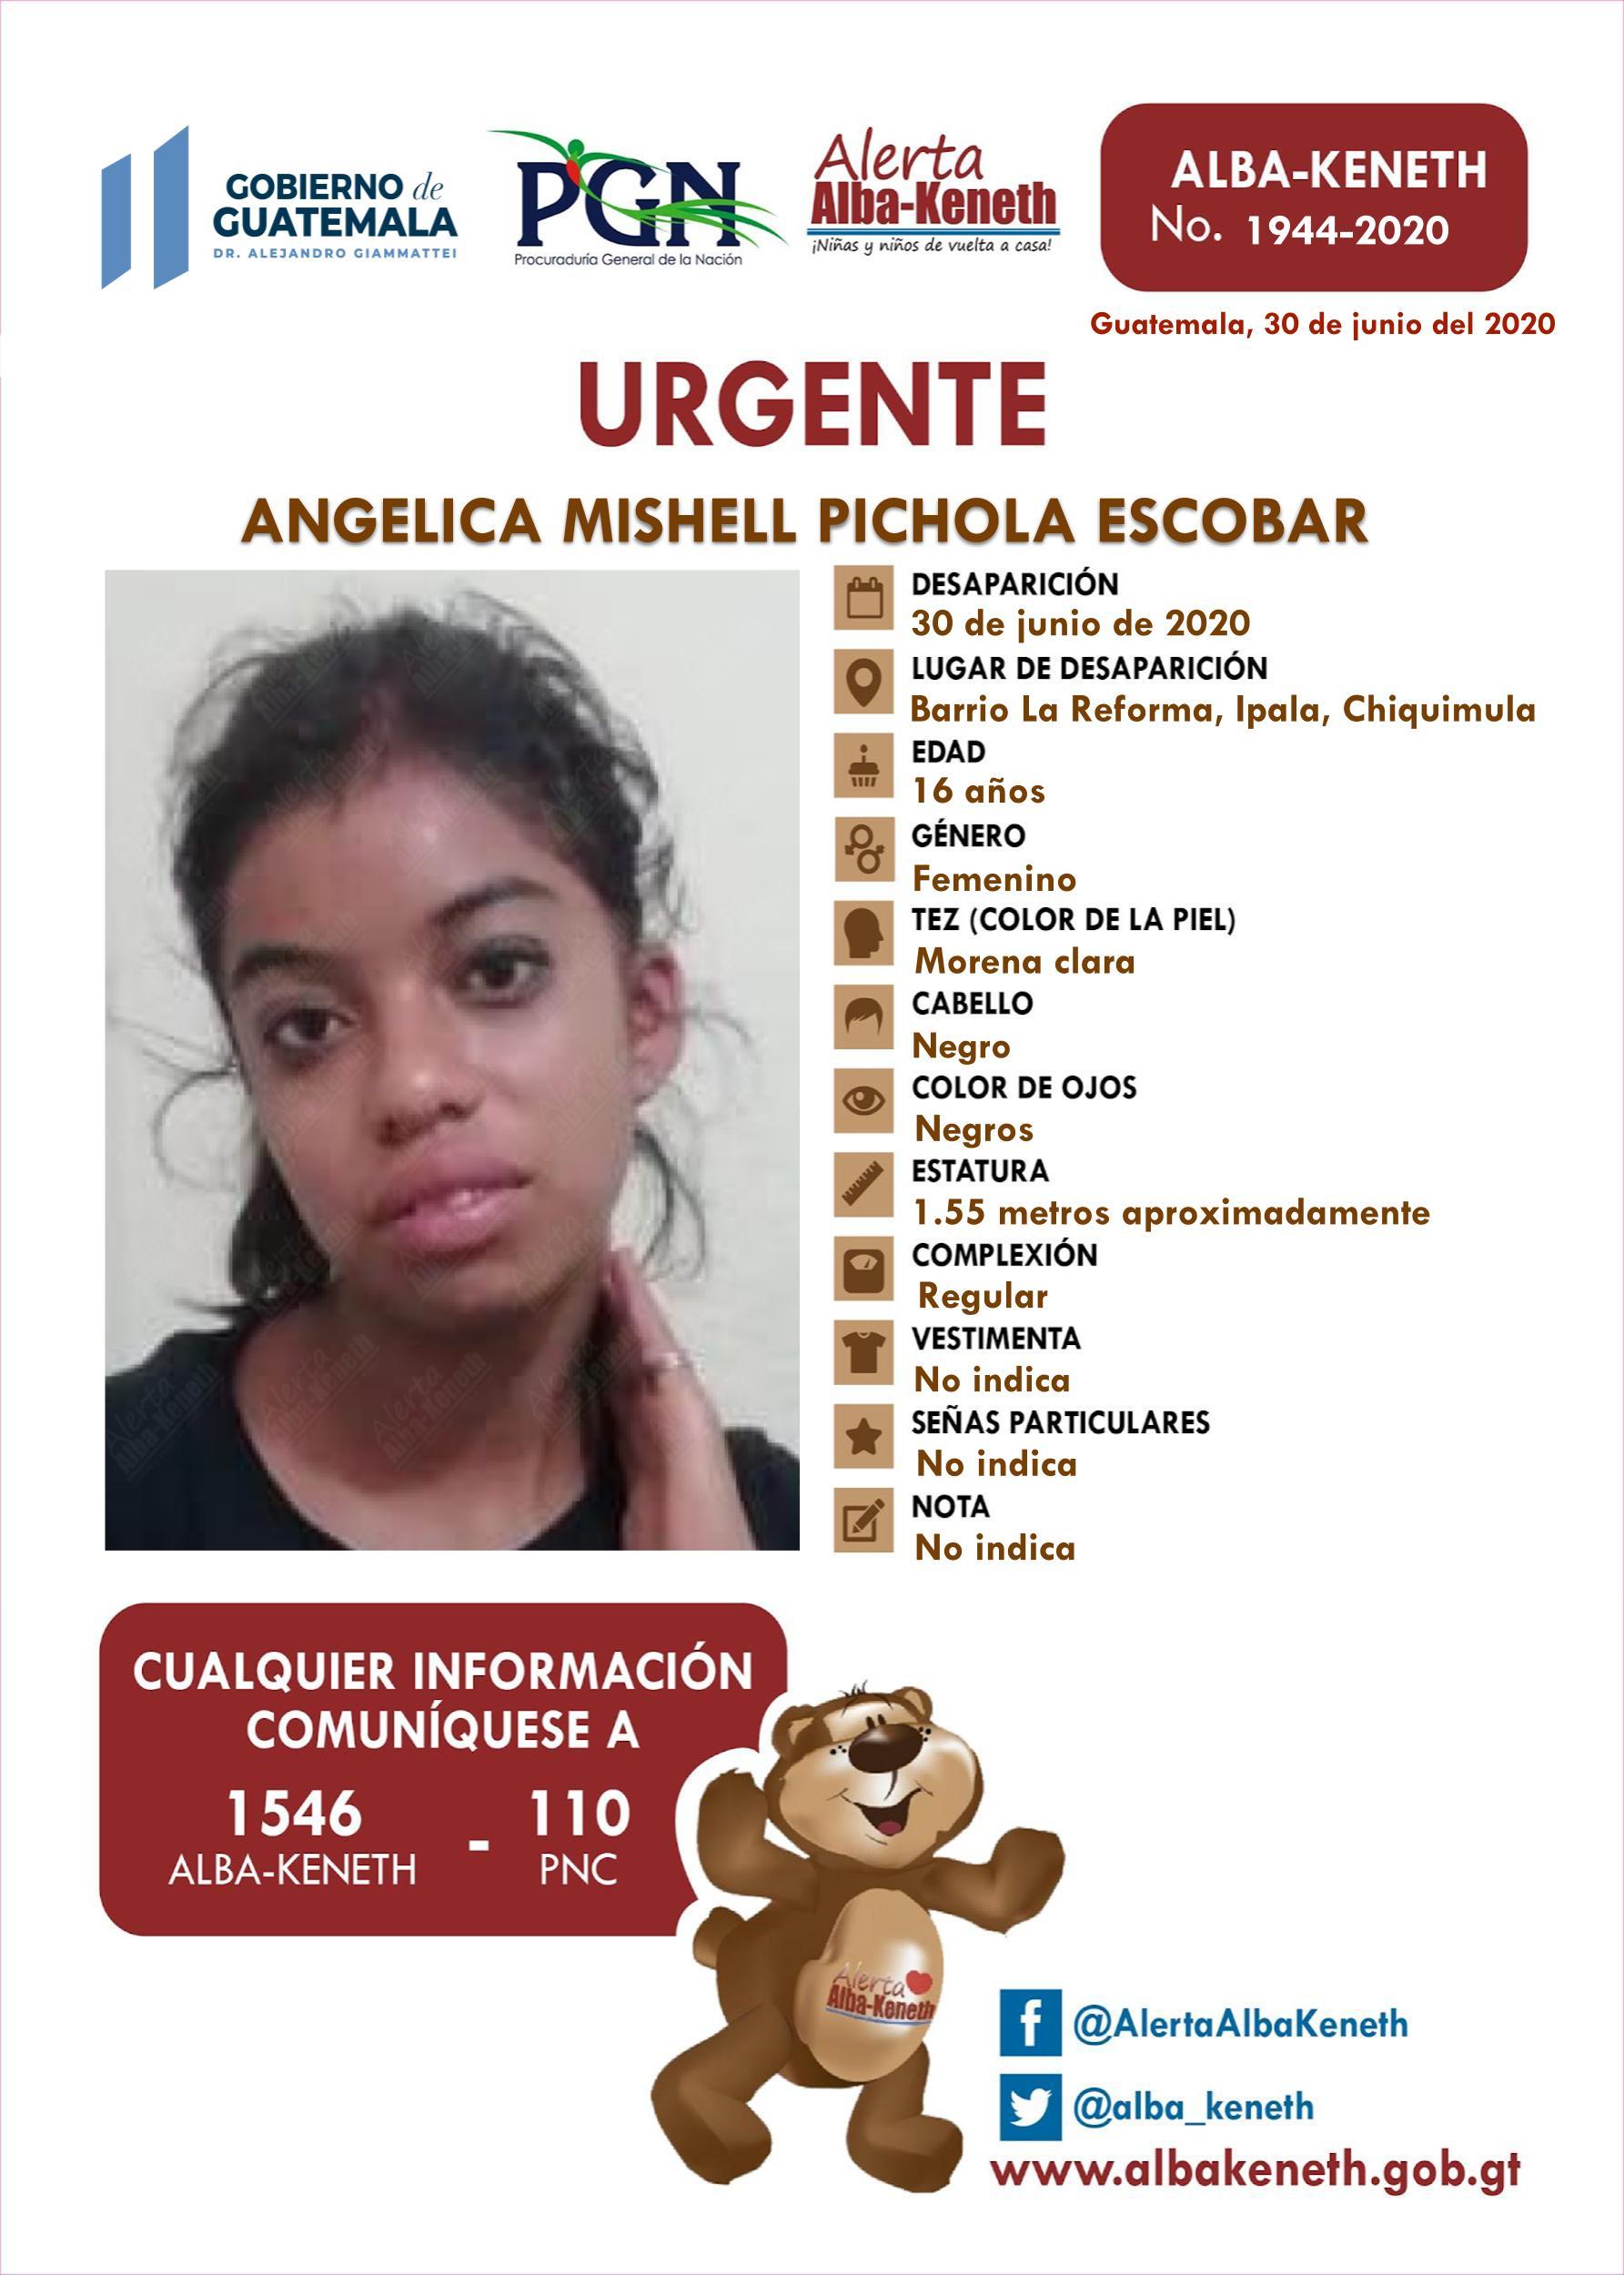 Angelica Mishell Pichola Escobar